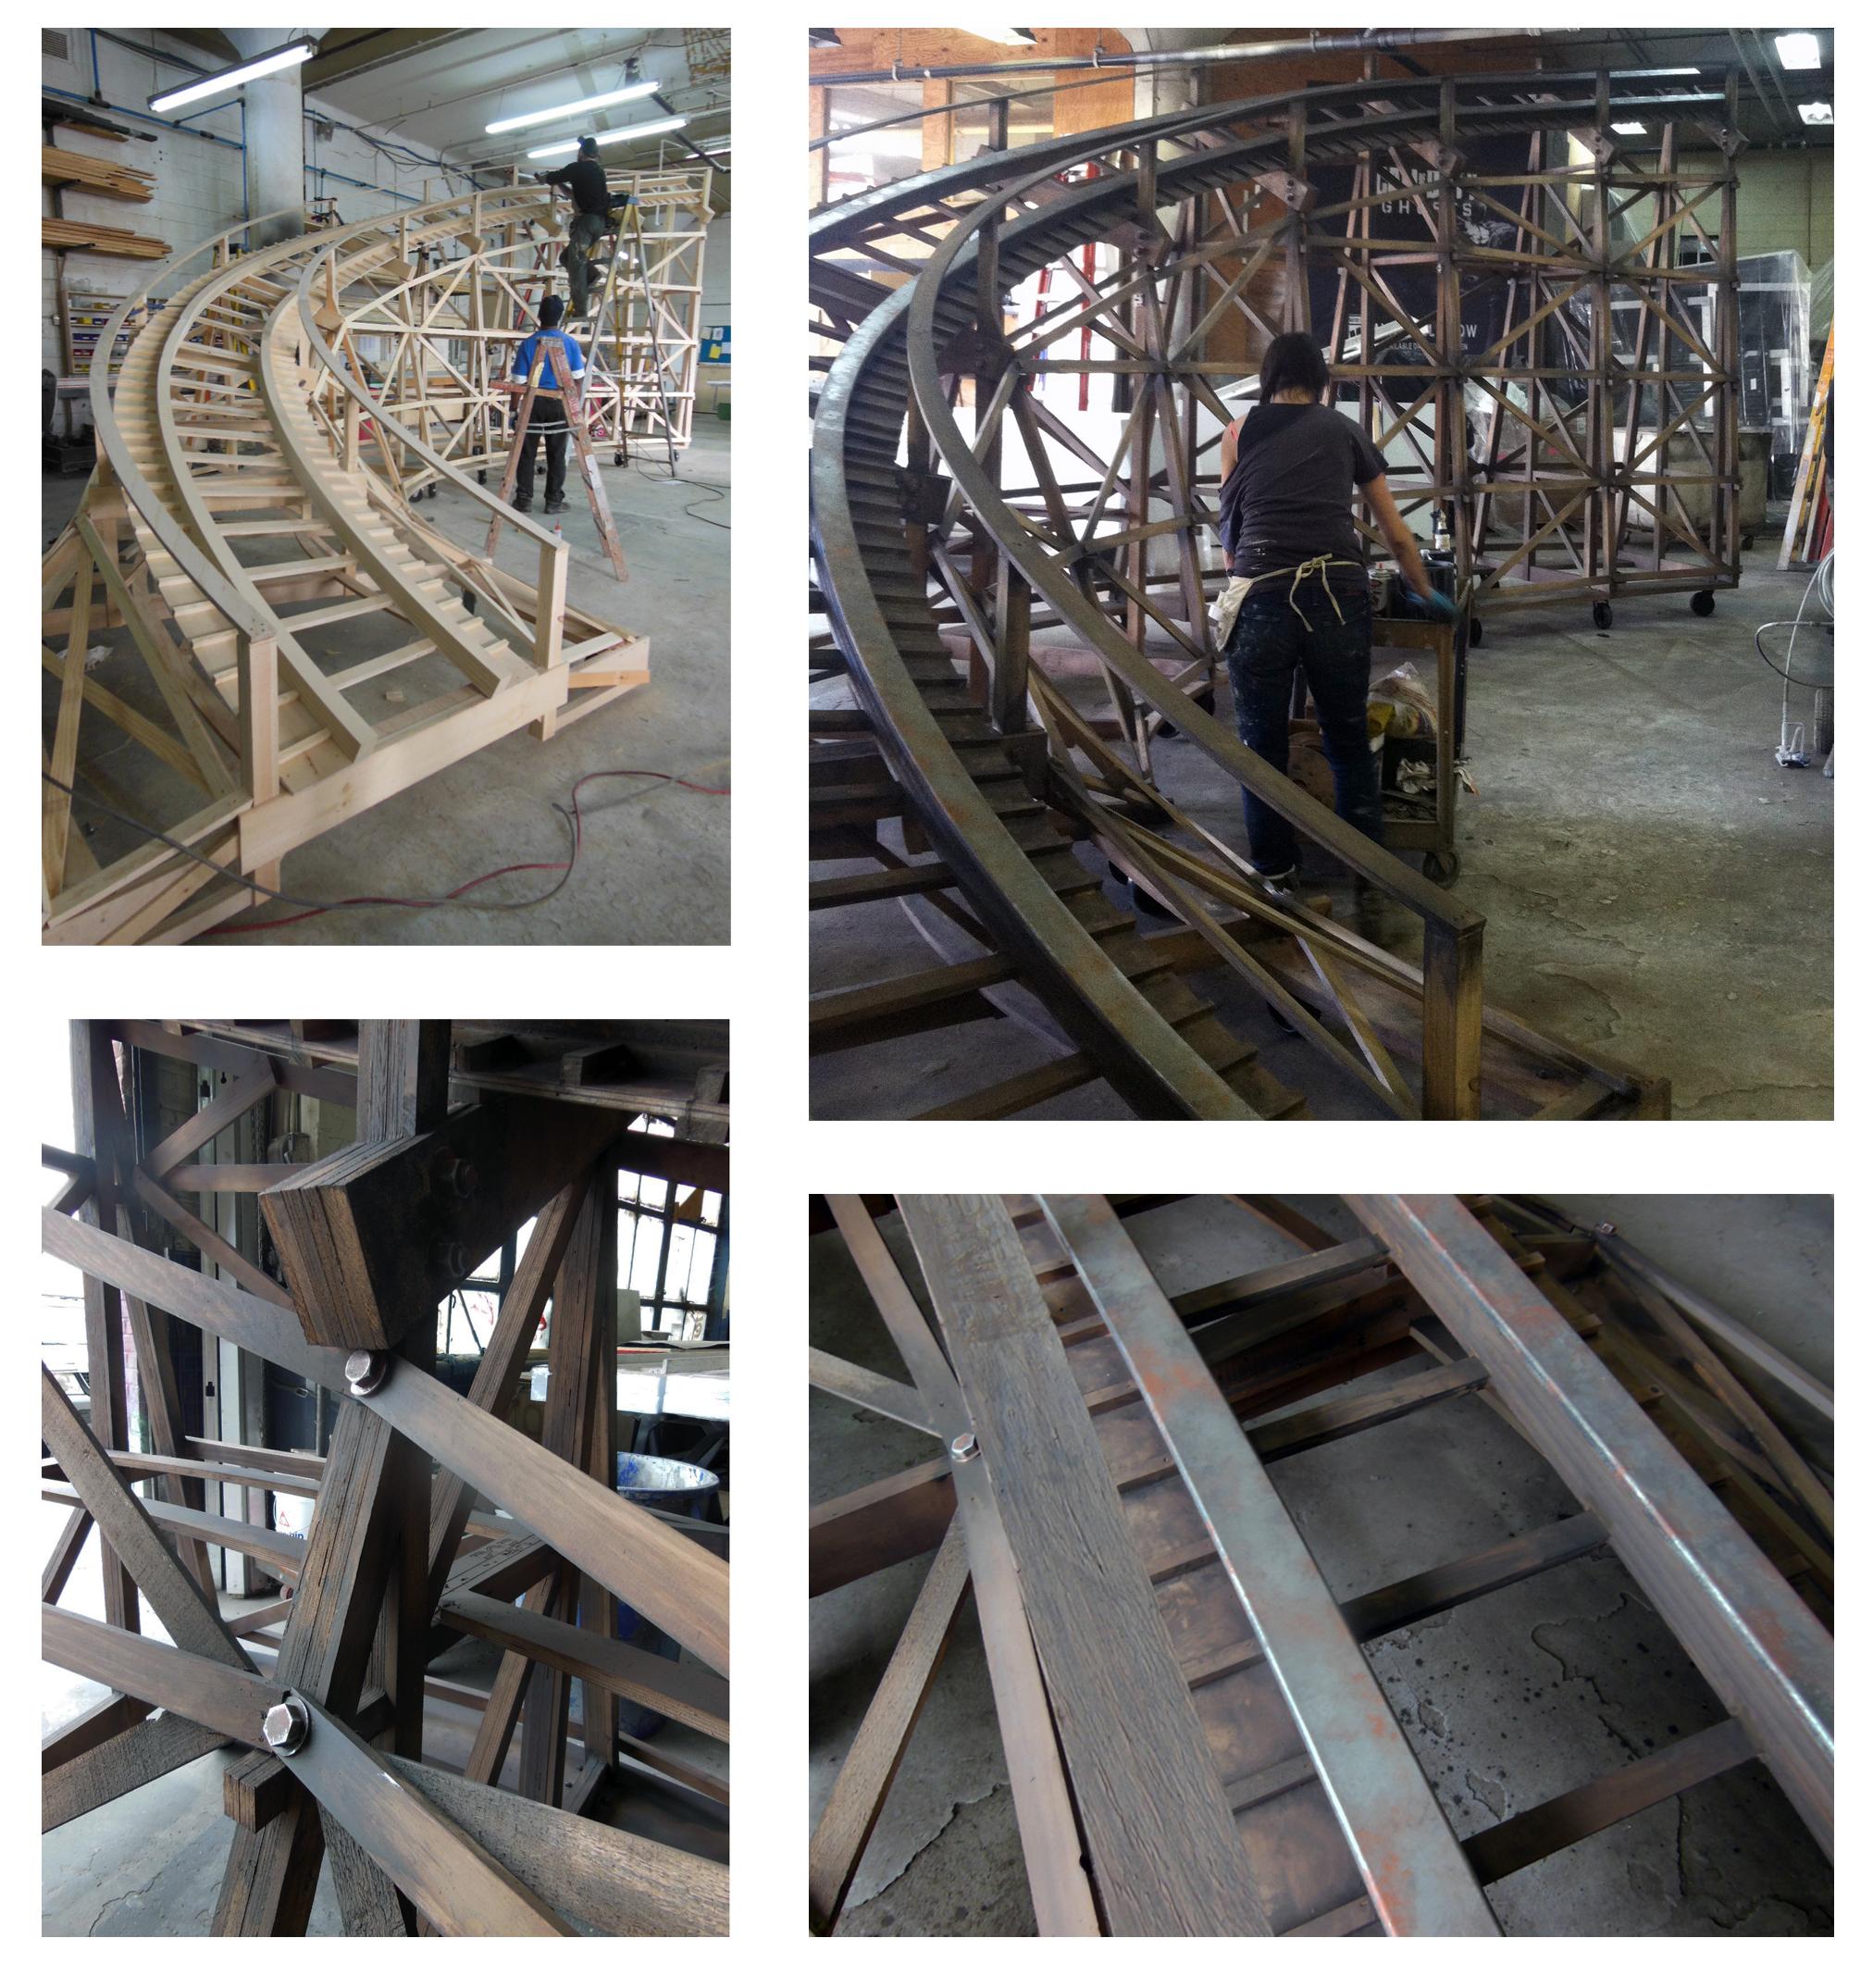 Roller Coaster in Progress Assembly